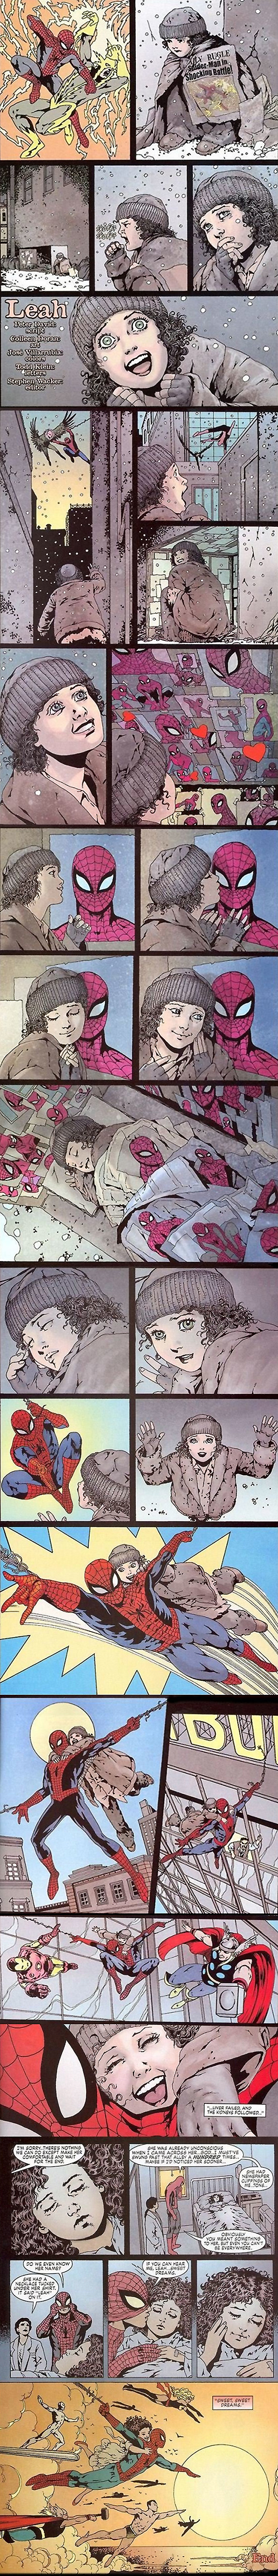 Damn it Spiderman!